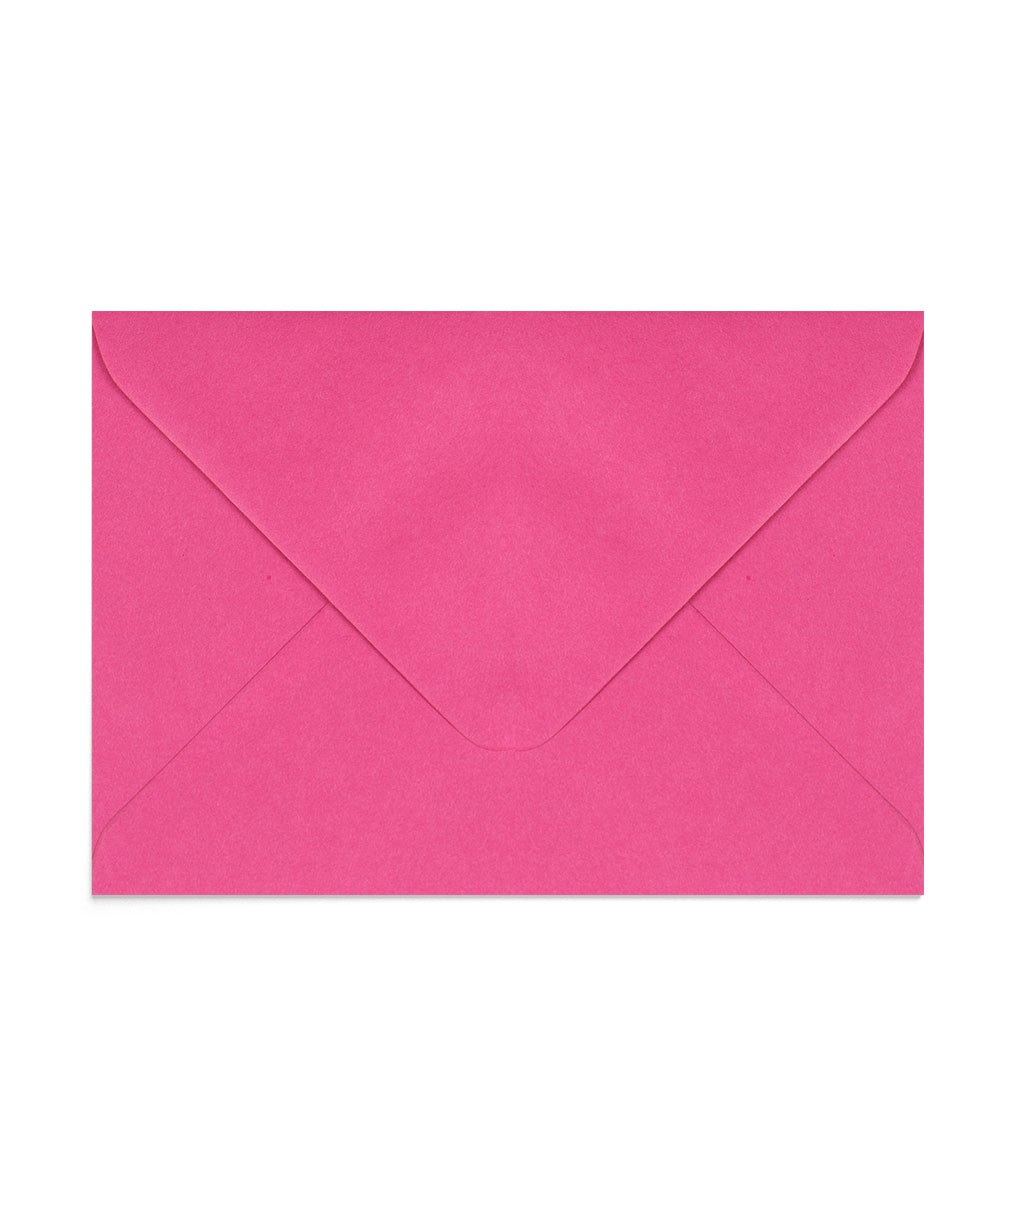 Plic C6 roz fuchsia